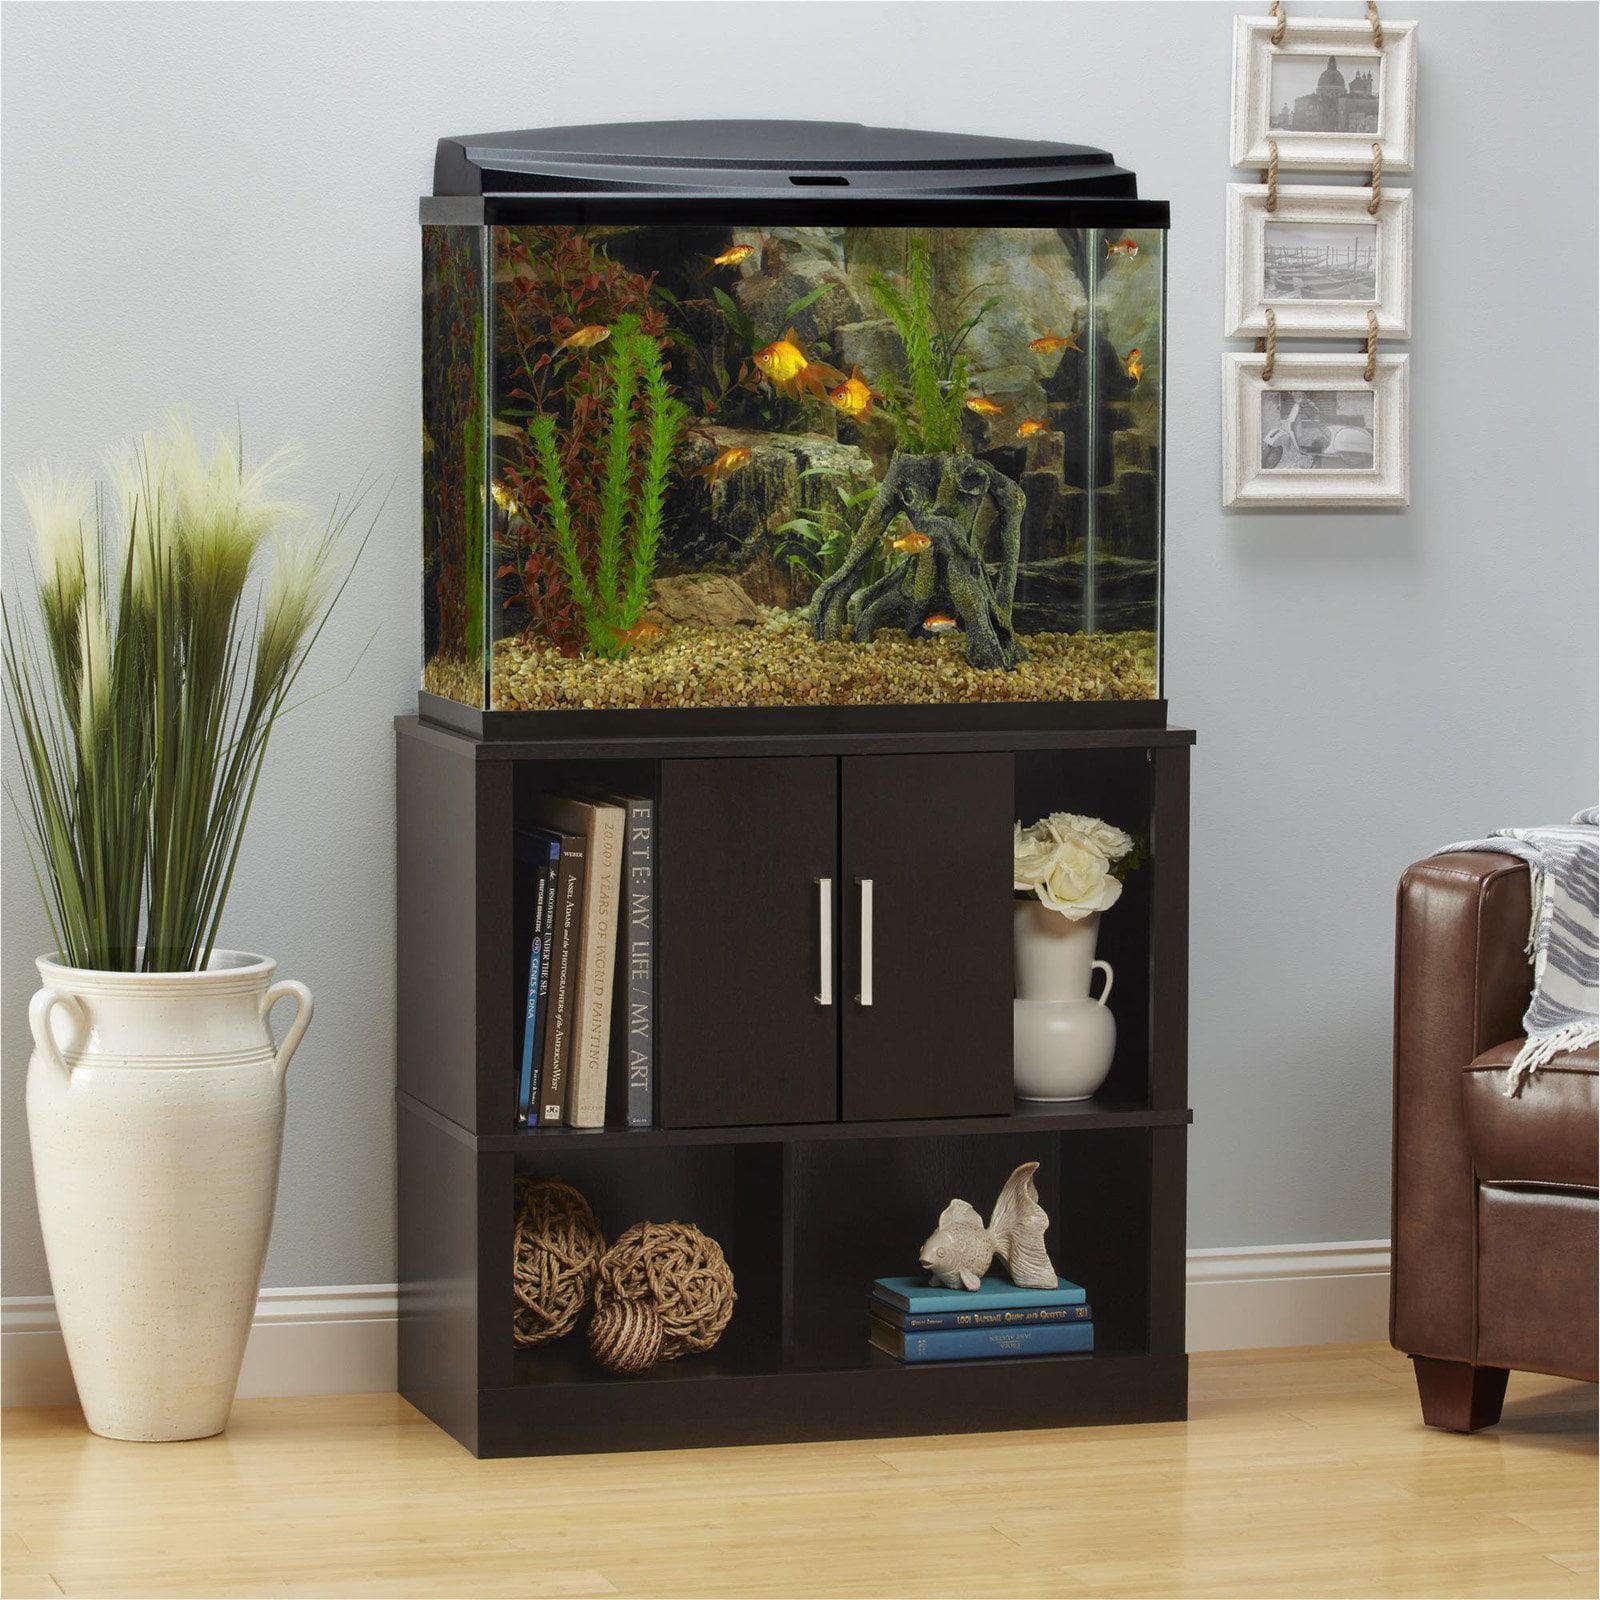 Altra Furniture Laguna Tide Aquarium Stand   Espresso   Walmart.com